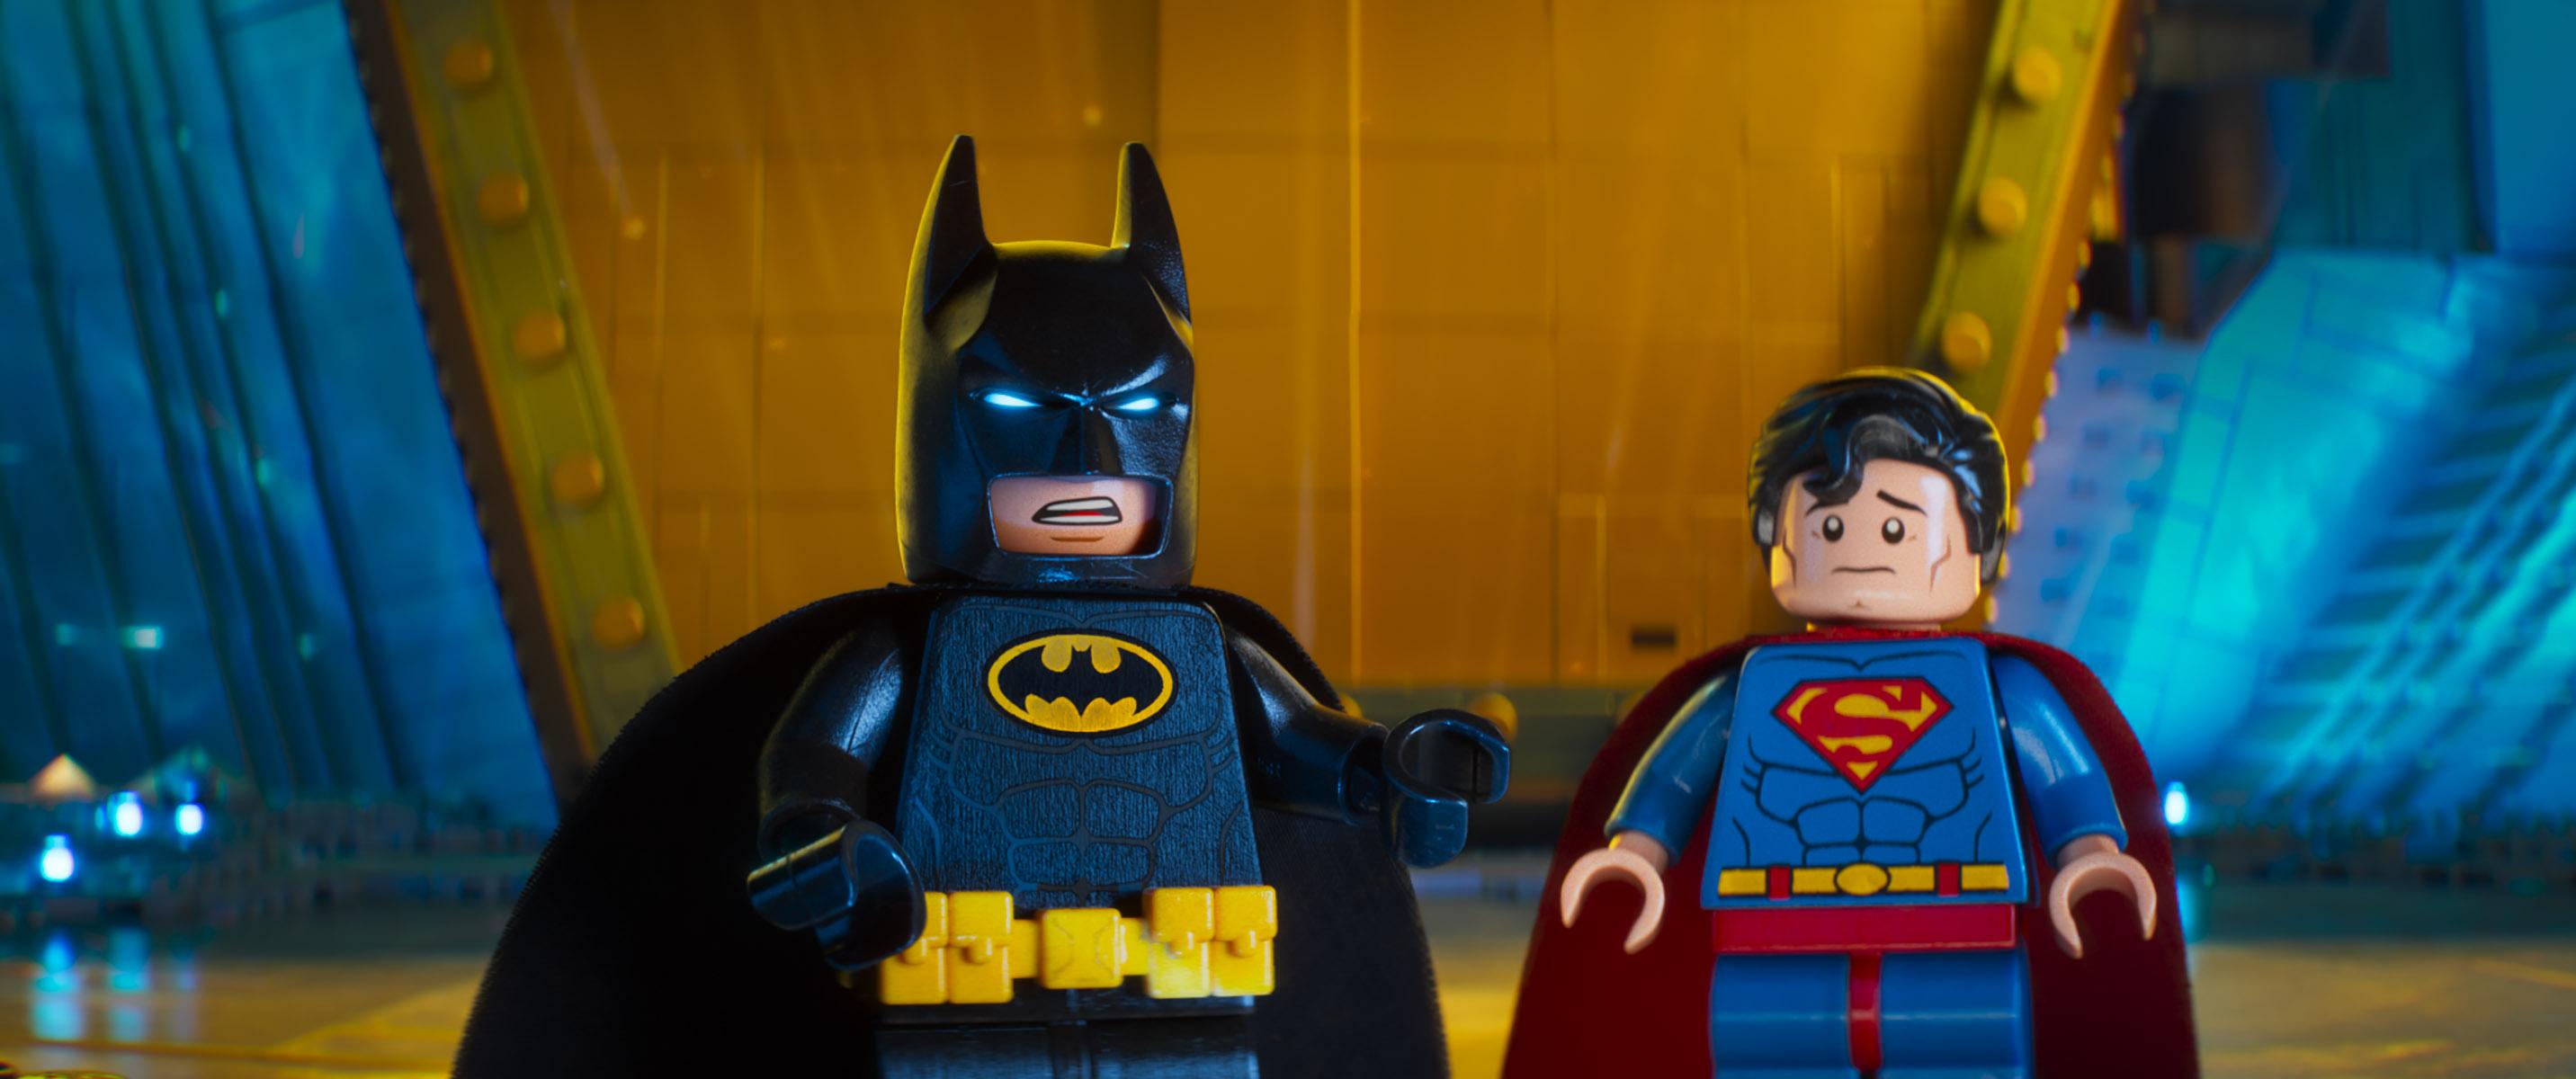 Full The Lego Batman Movie Voice Cast Includes Awesome Celebrity Cameos Batman News